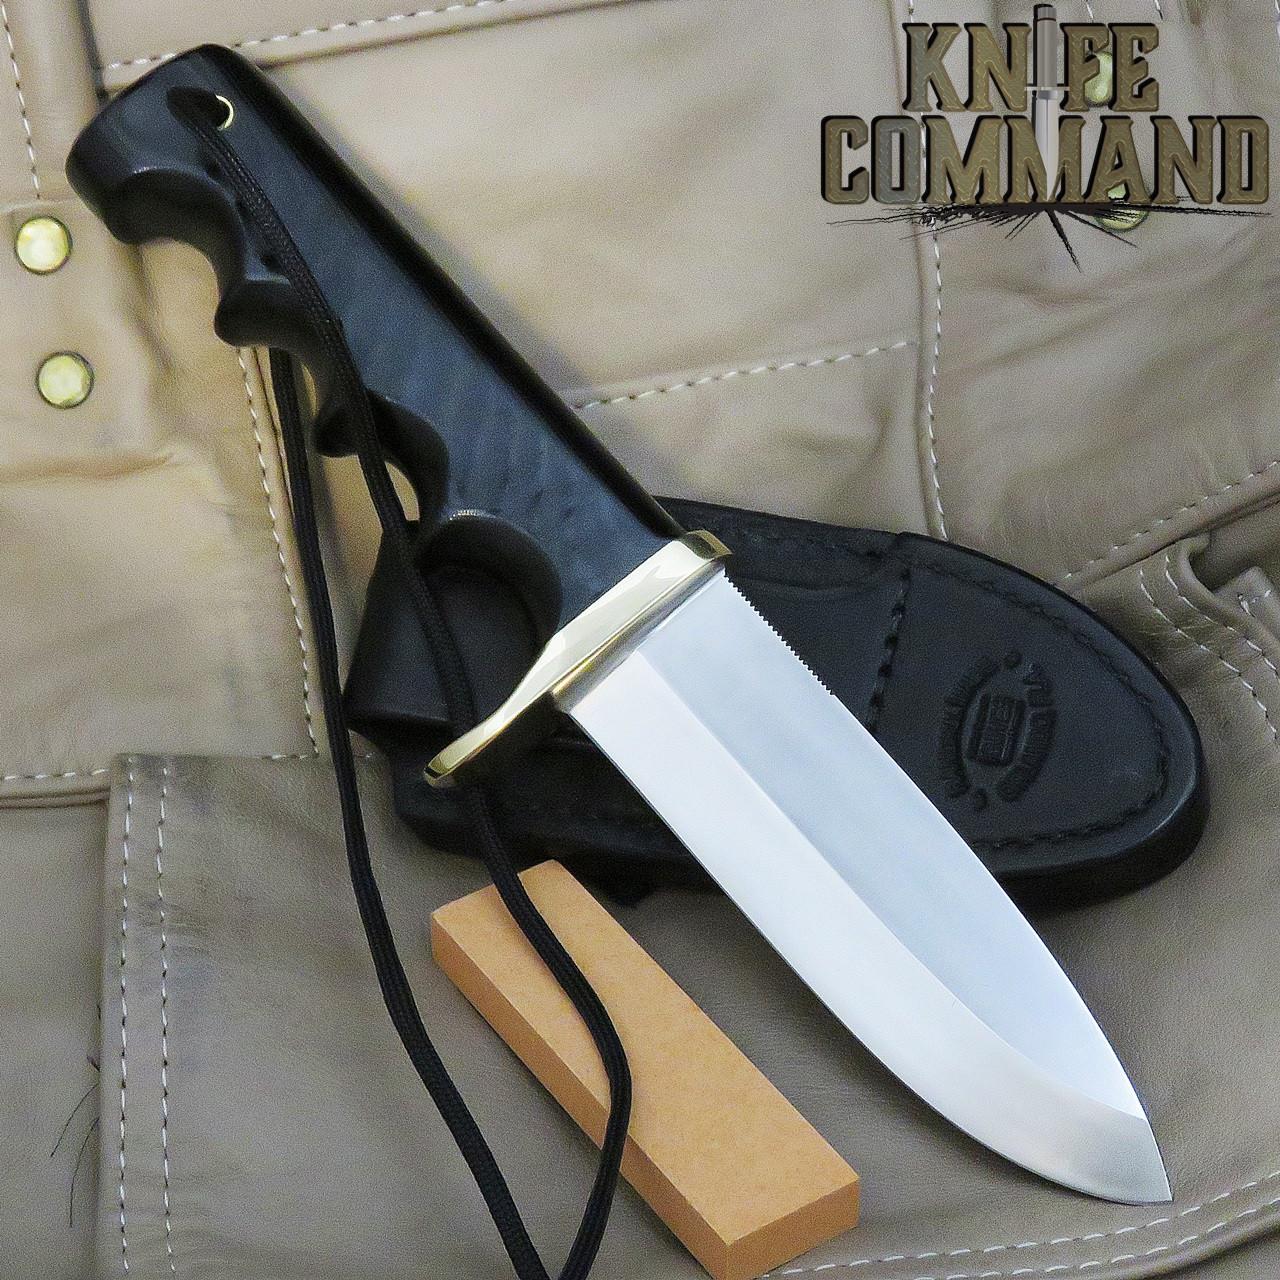 Randall Made Knives Non-Catalog Fireman Special Knife Black Micarta, Black Sheath